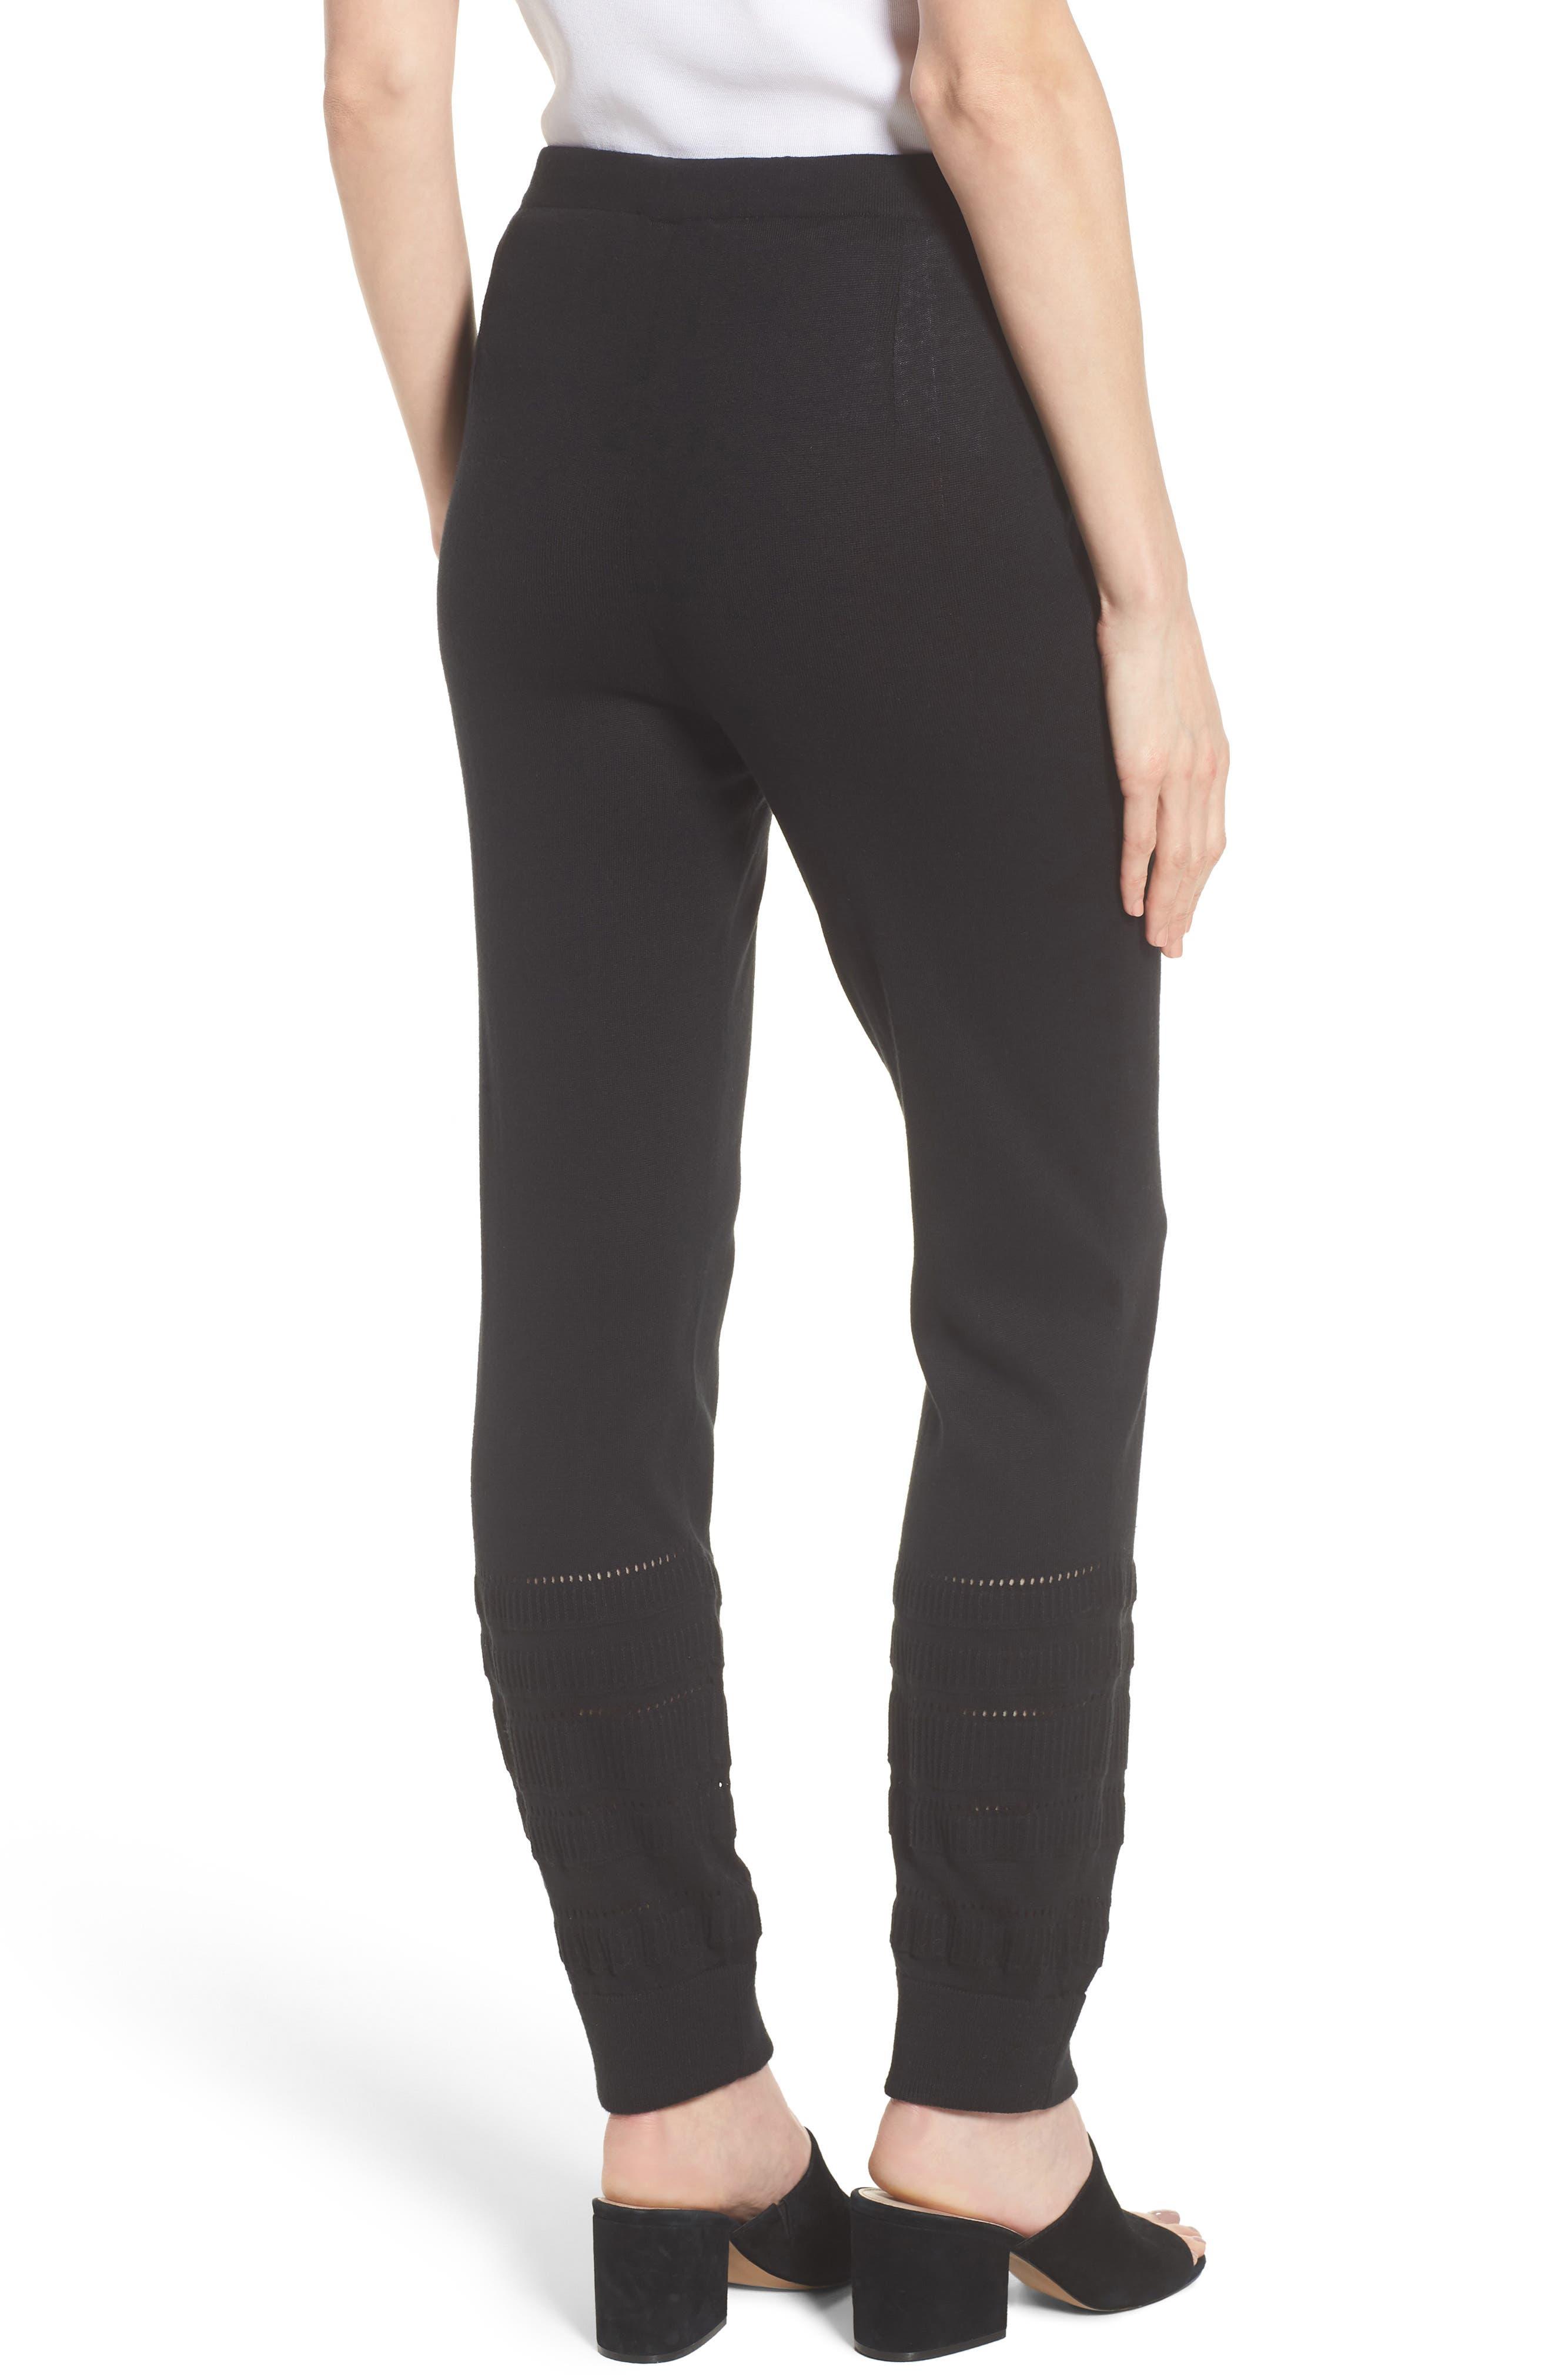 Knit Ankle Pants,                             Alternate thumbnail 2, color,                             Black